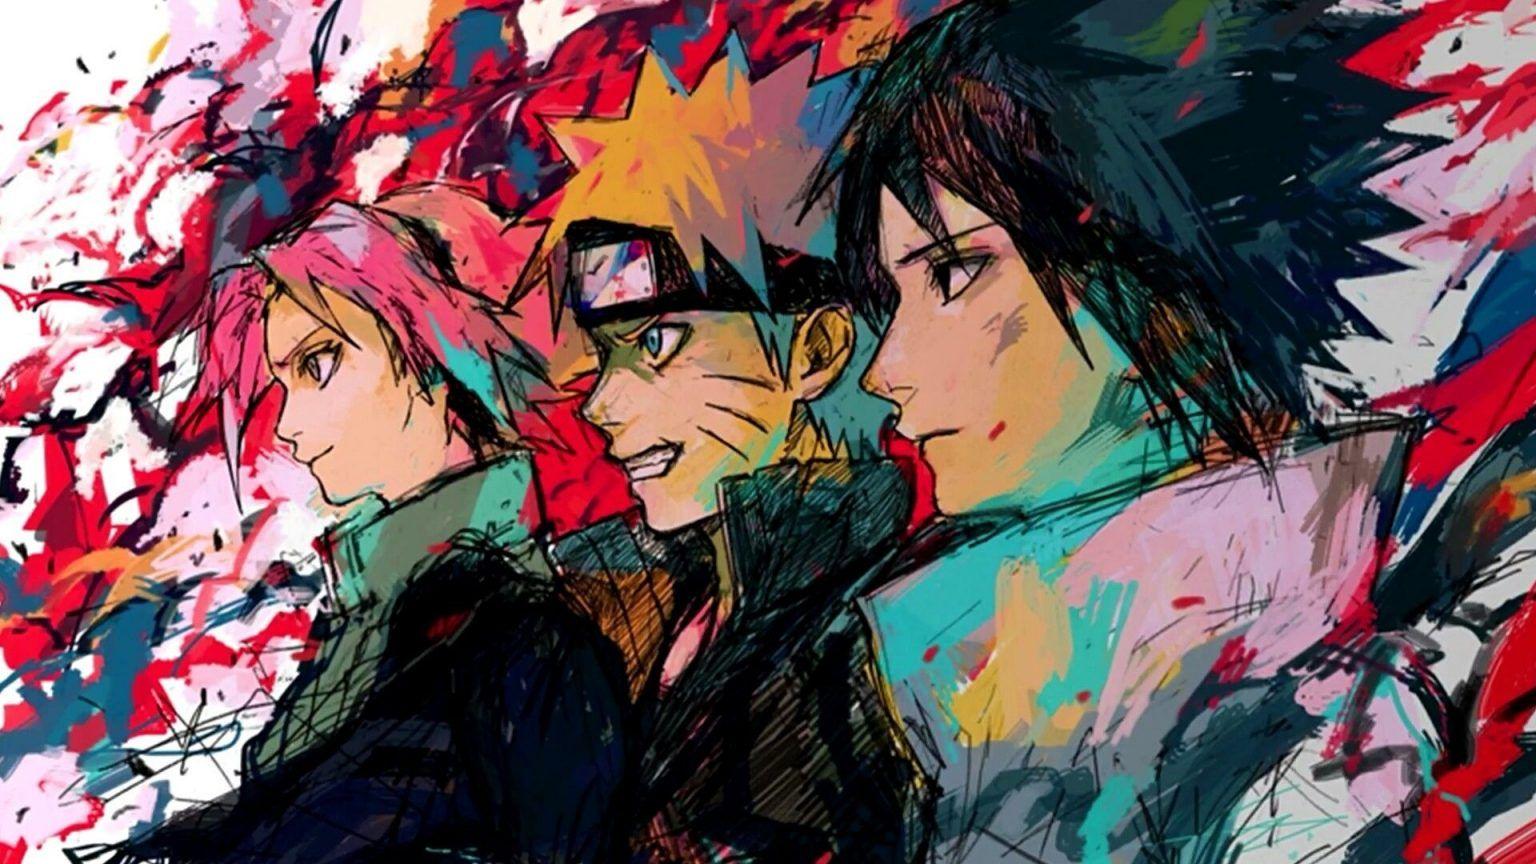 Fond D Ecran Naruto Hd Et 4k A Telecharger Gratuit En 2020 Naruto Fond Ecran Coloriage Naruto Naruto